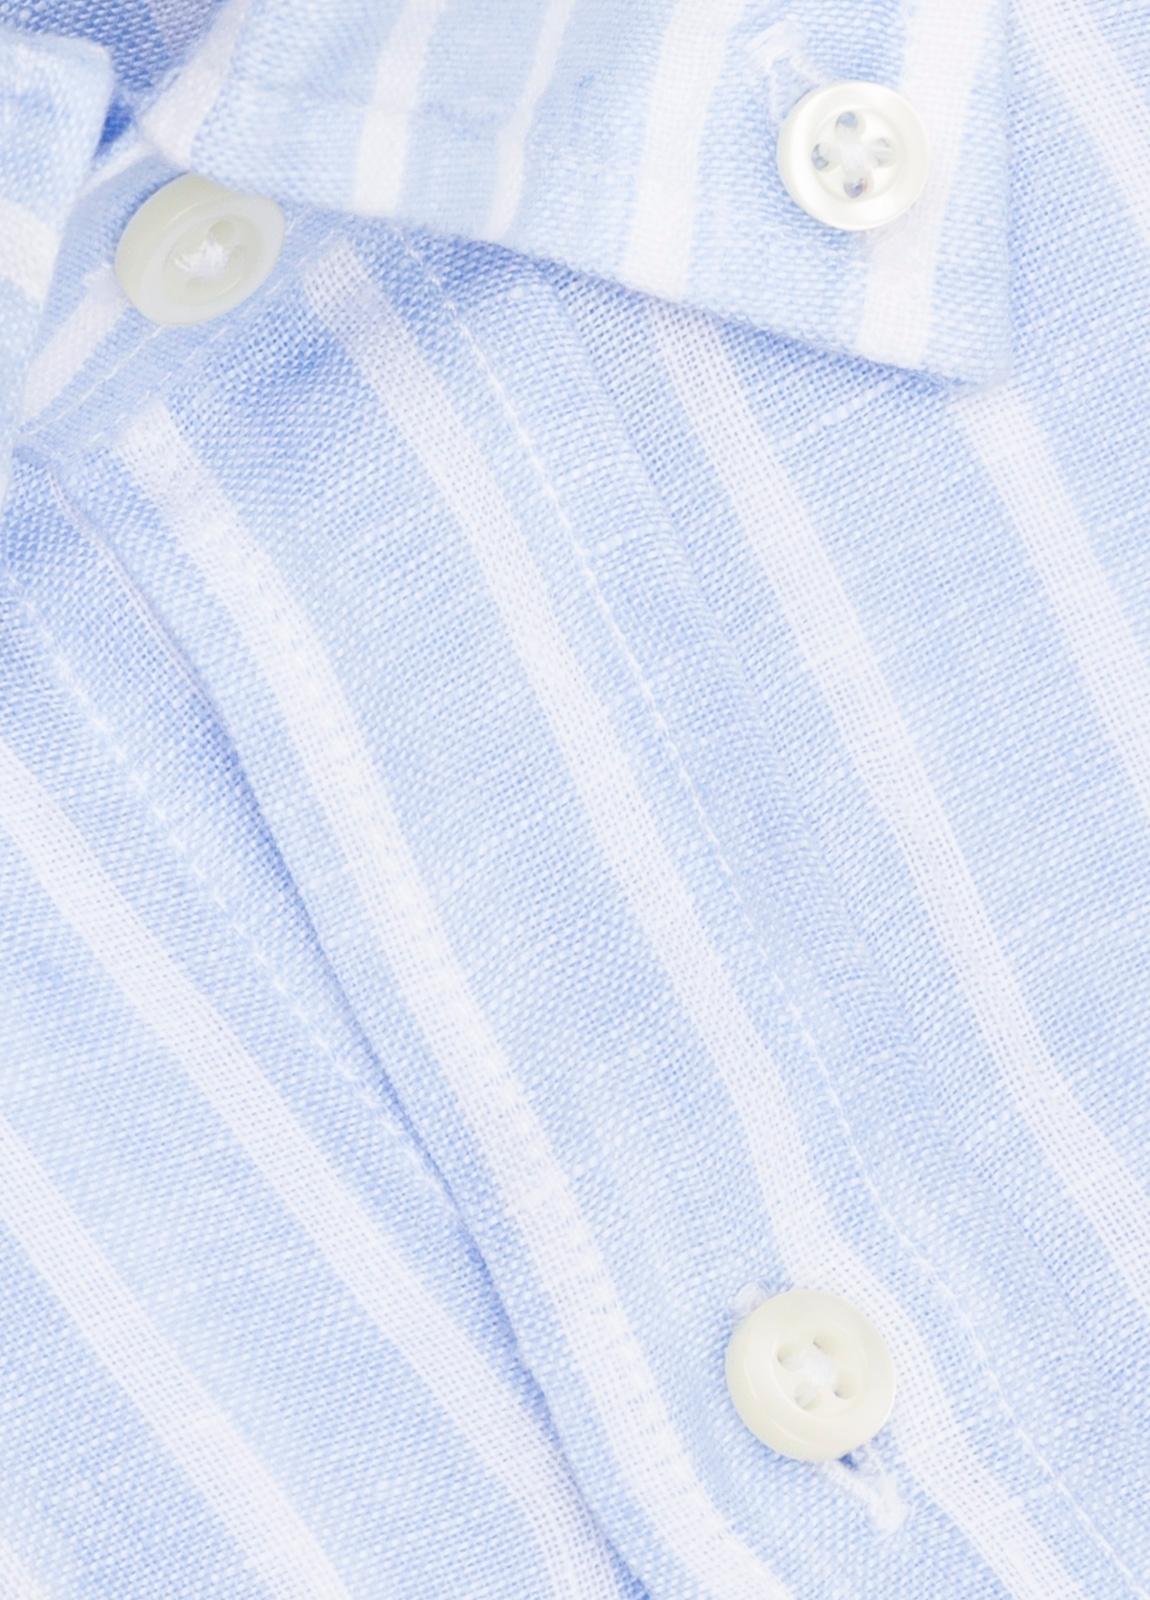 Camisa M/Corta sport FUREST COLECCIÓN Regular FIT Lino rayas celeste - Ítem1